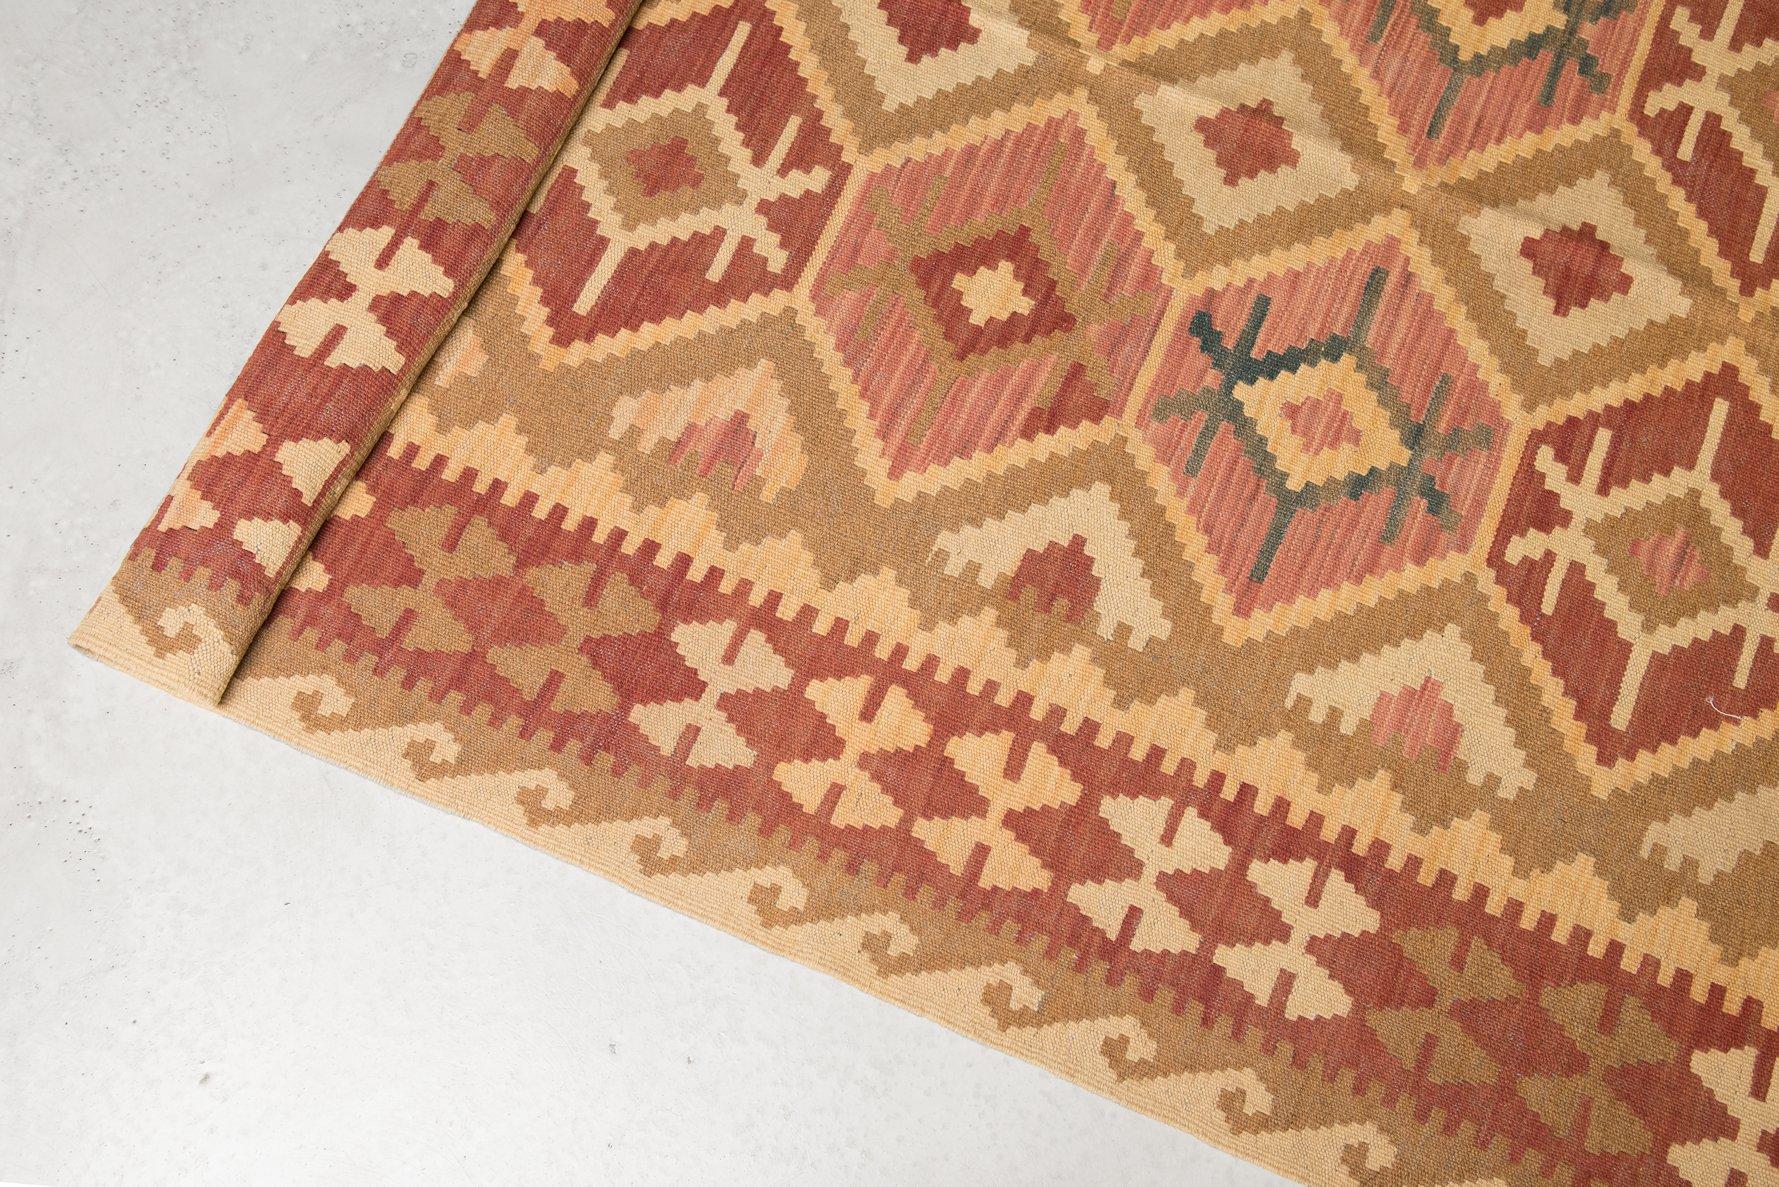 Tappeti Kilim Moderni : Moderno grigio alfombras shaggy tappeti tappeti kilim turco buy